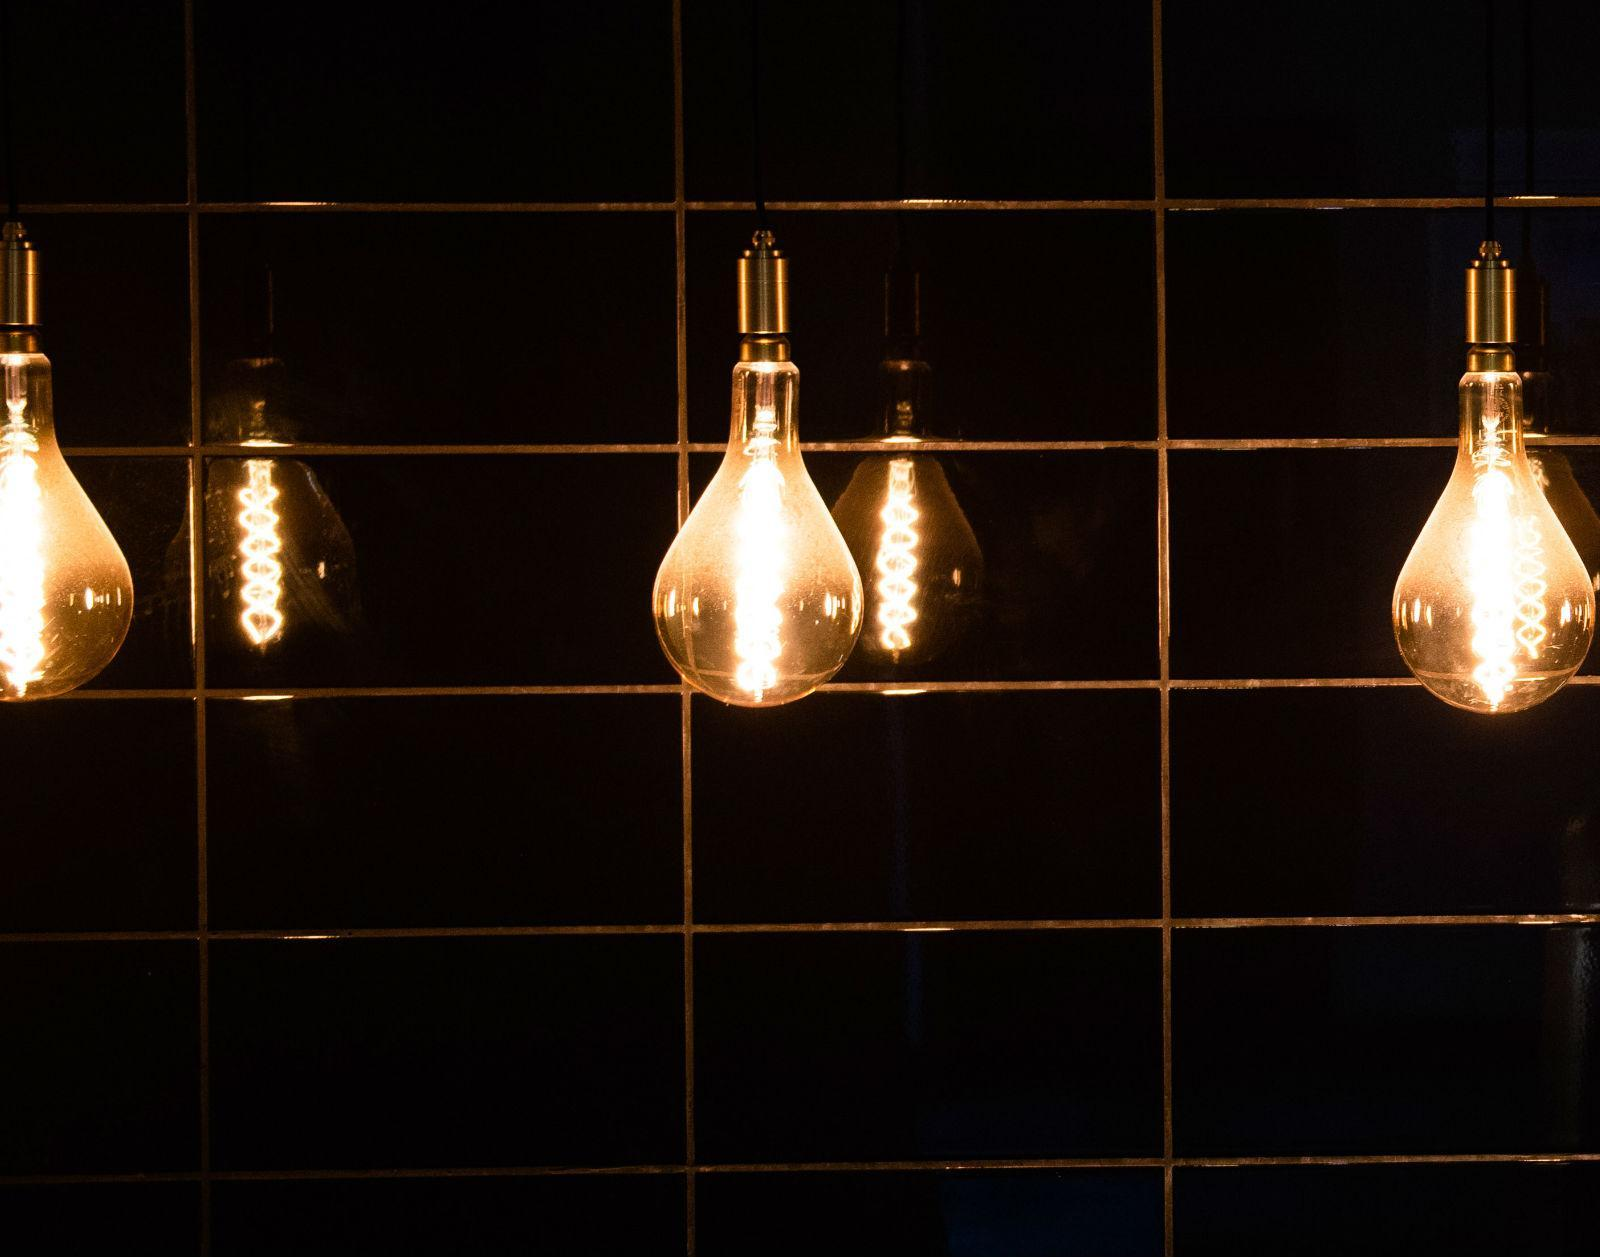 Restaurant lighting ideas decoration quiz rooms details living